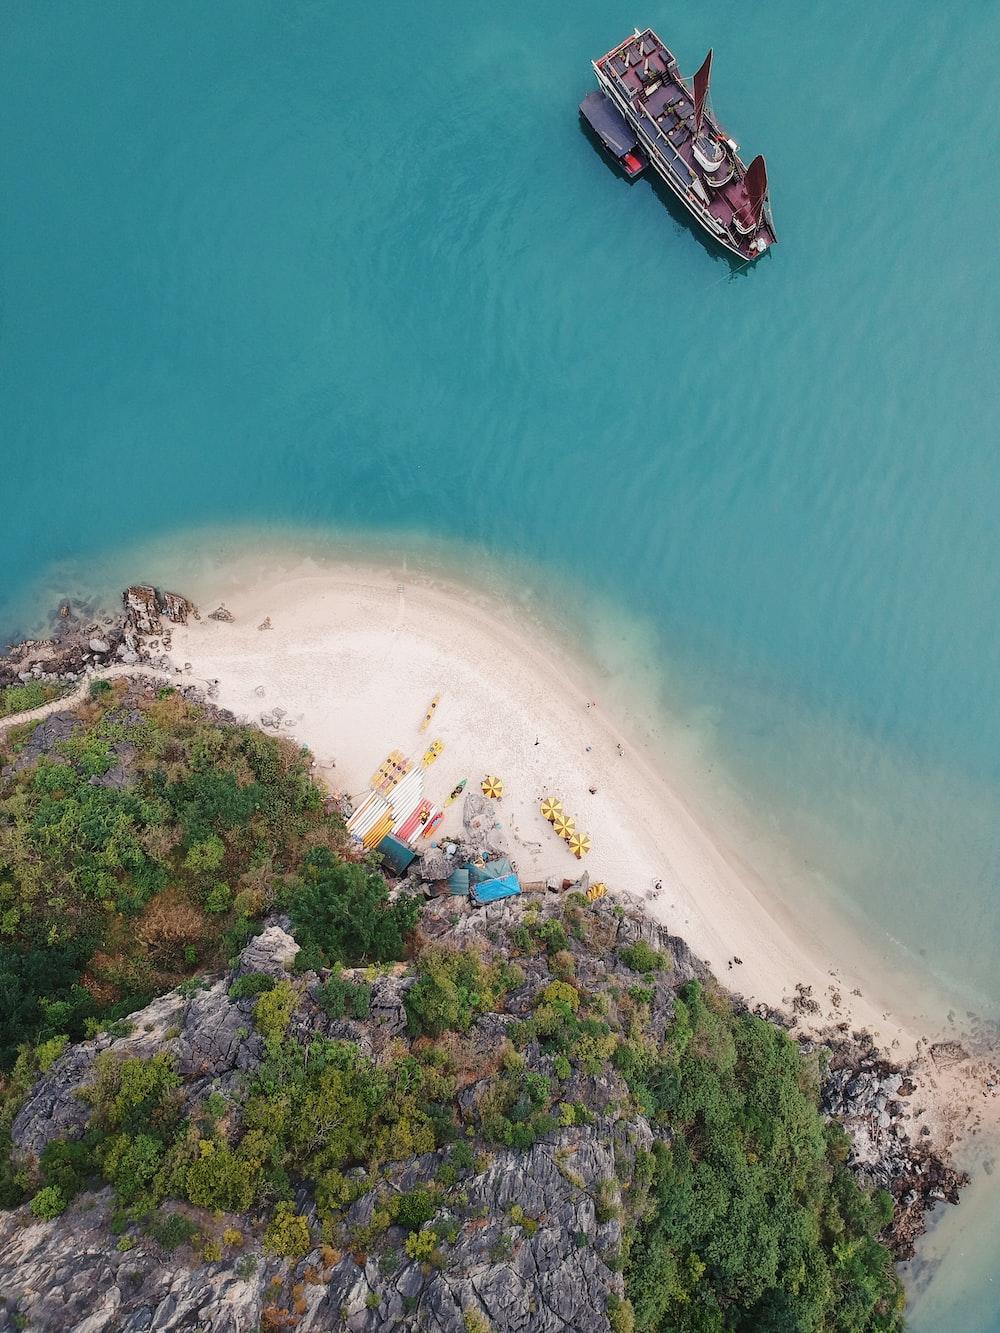 boat near seashore in aerial photography